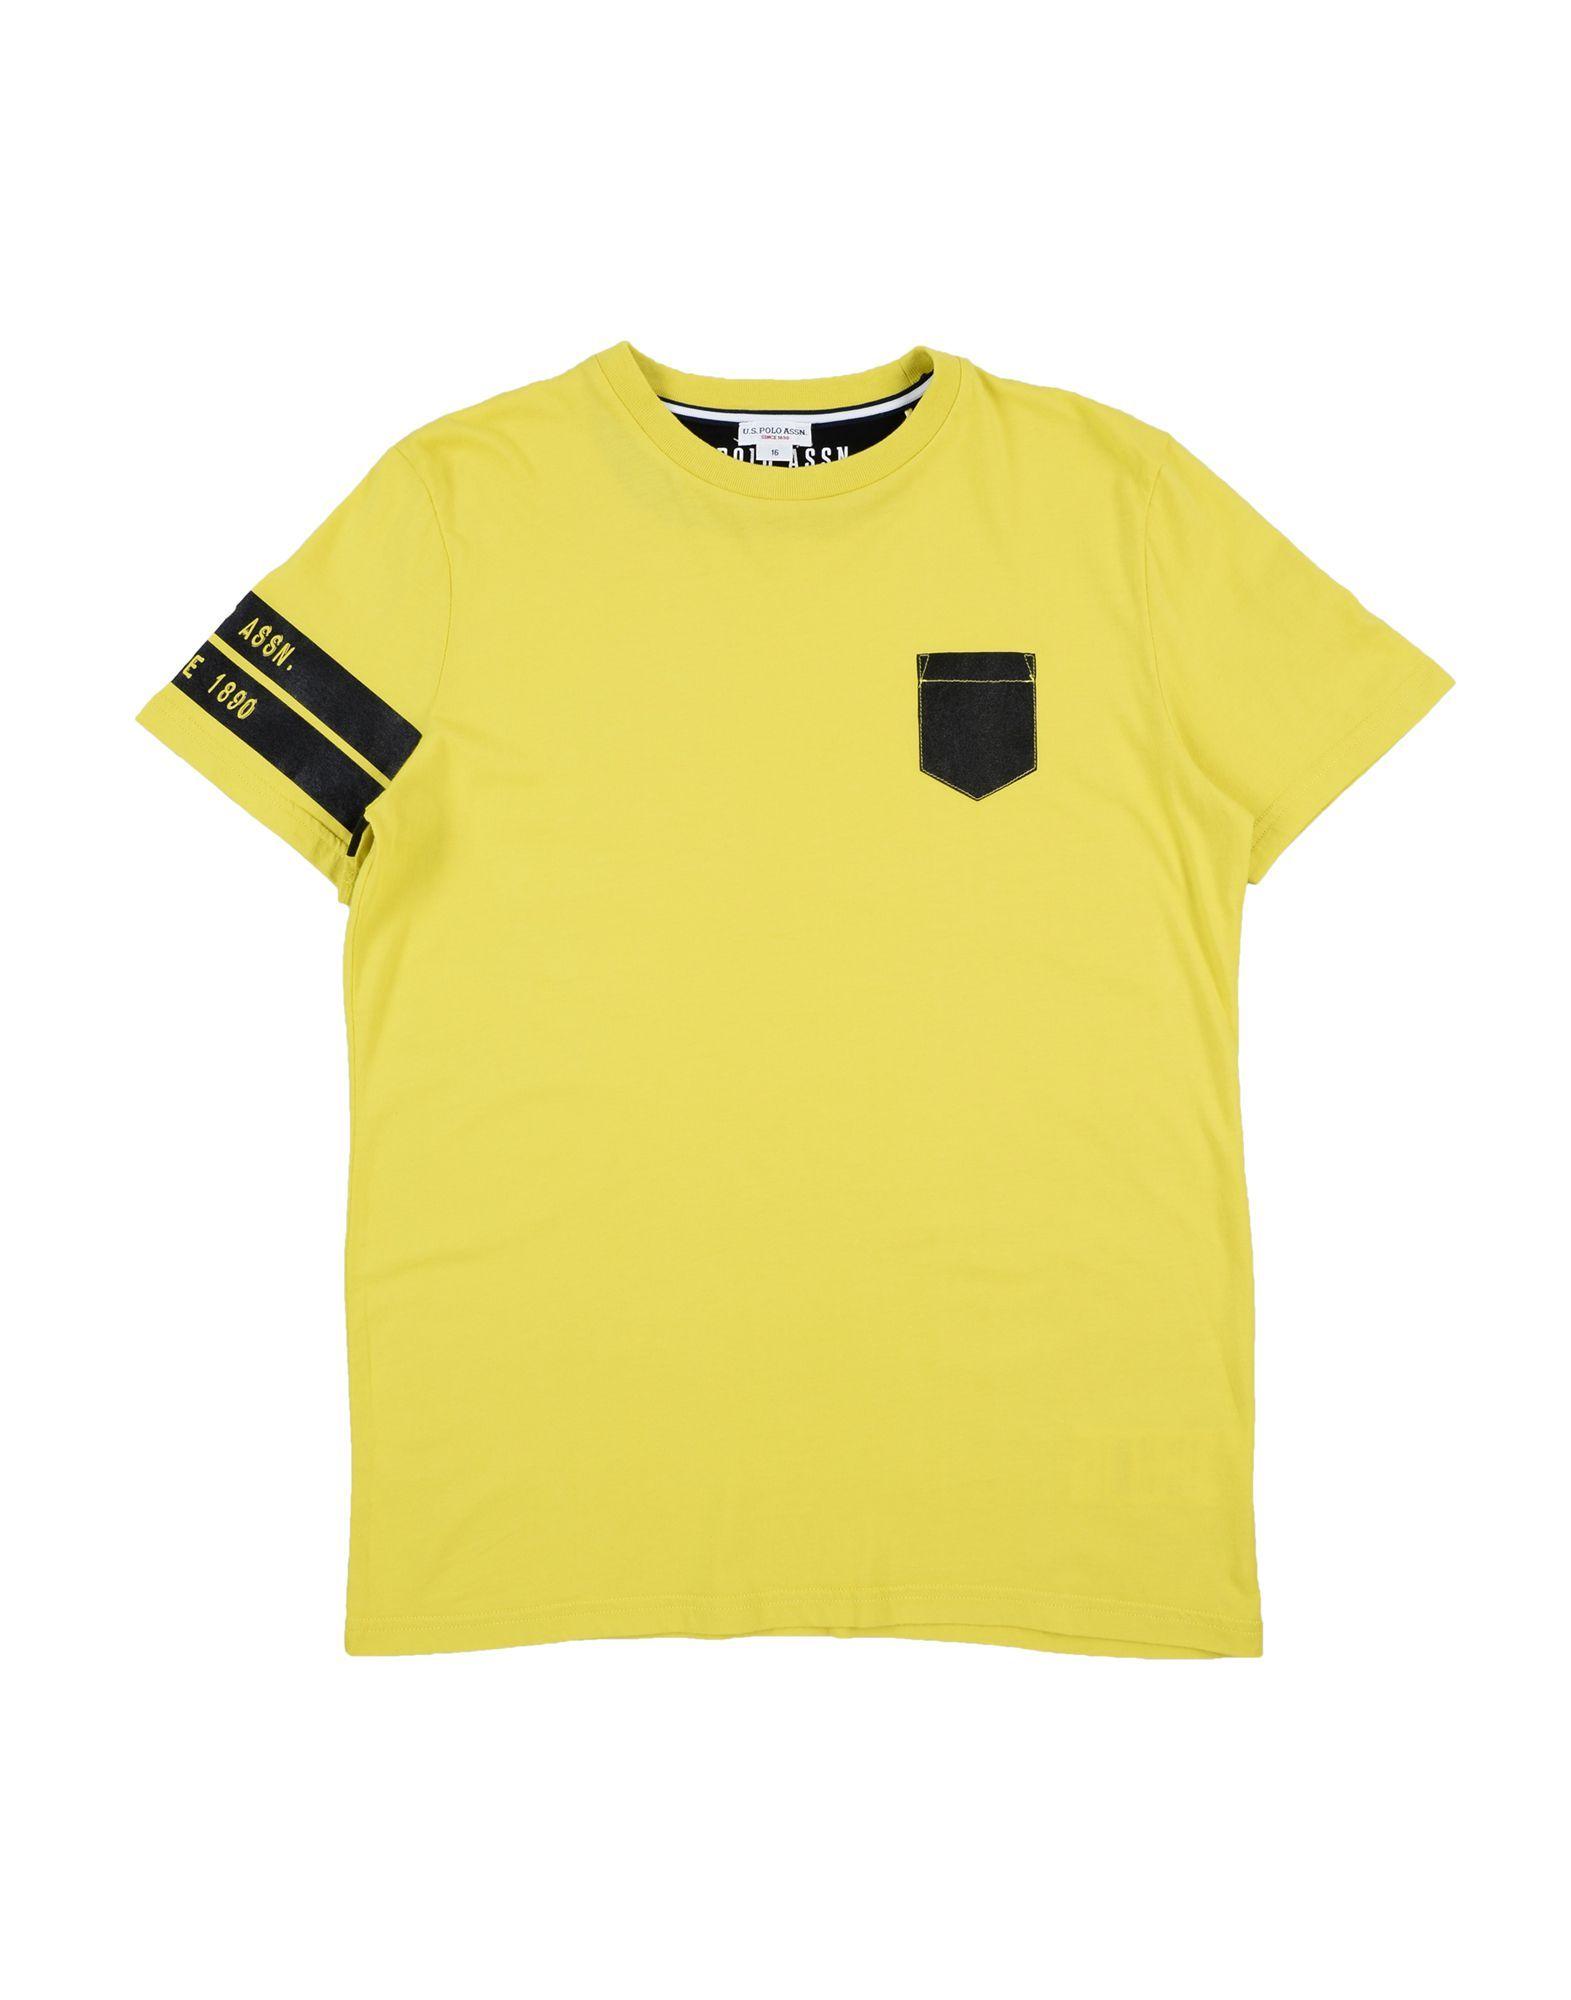 TOPWEAR Boy U.S.Polo Assn. Yellow Cotton